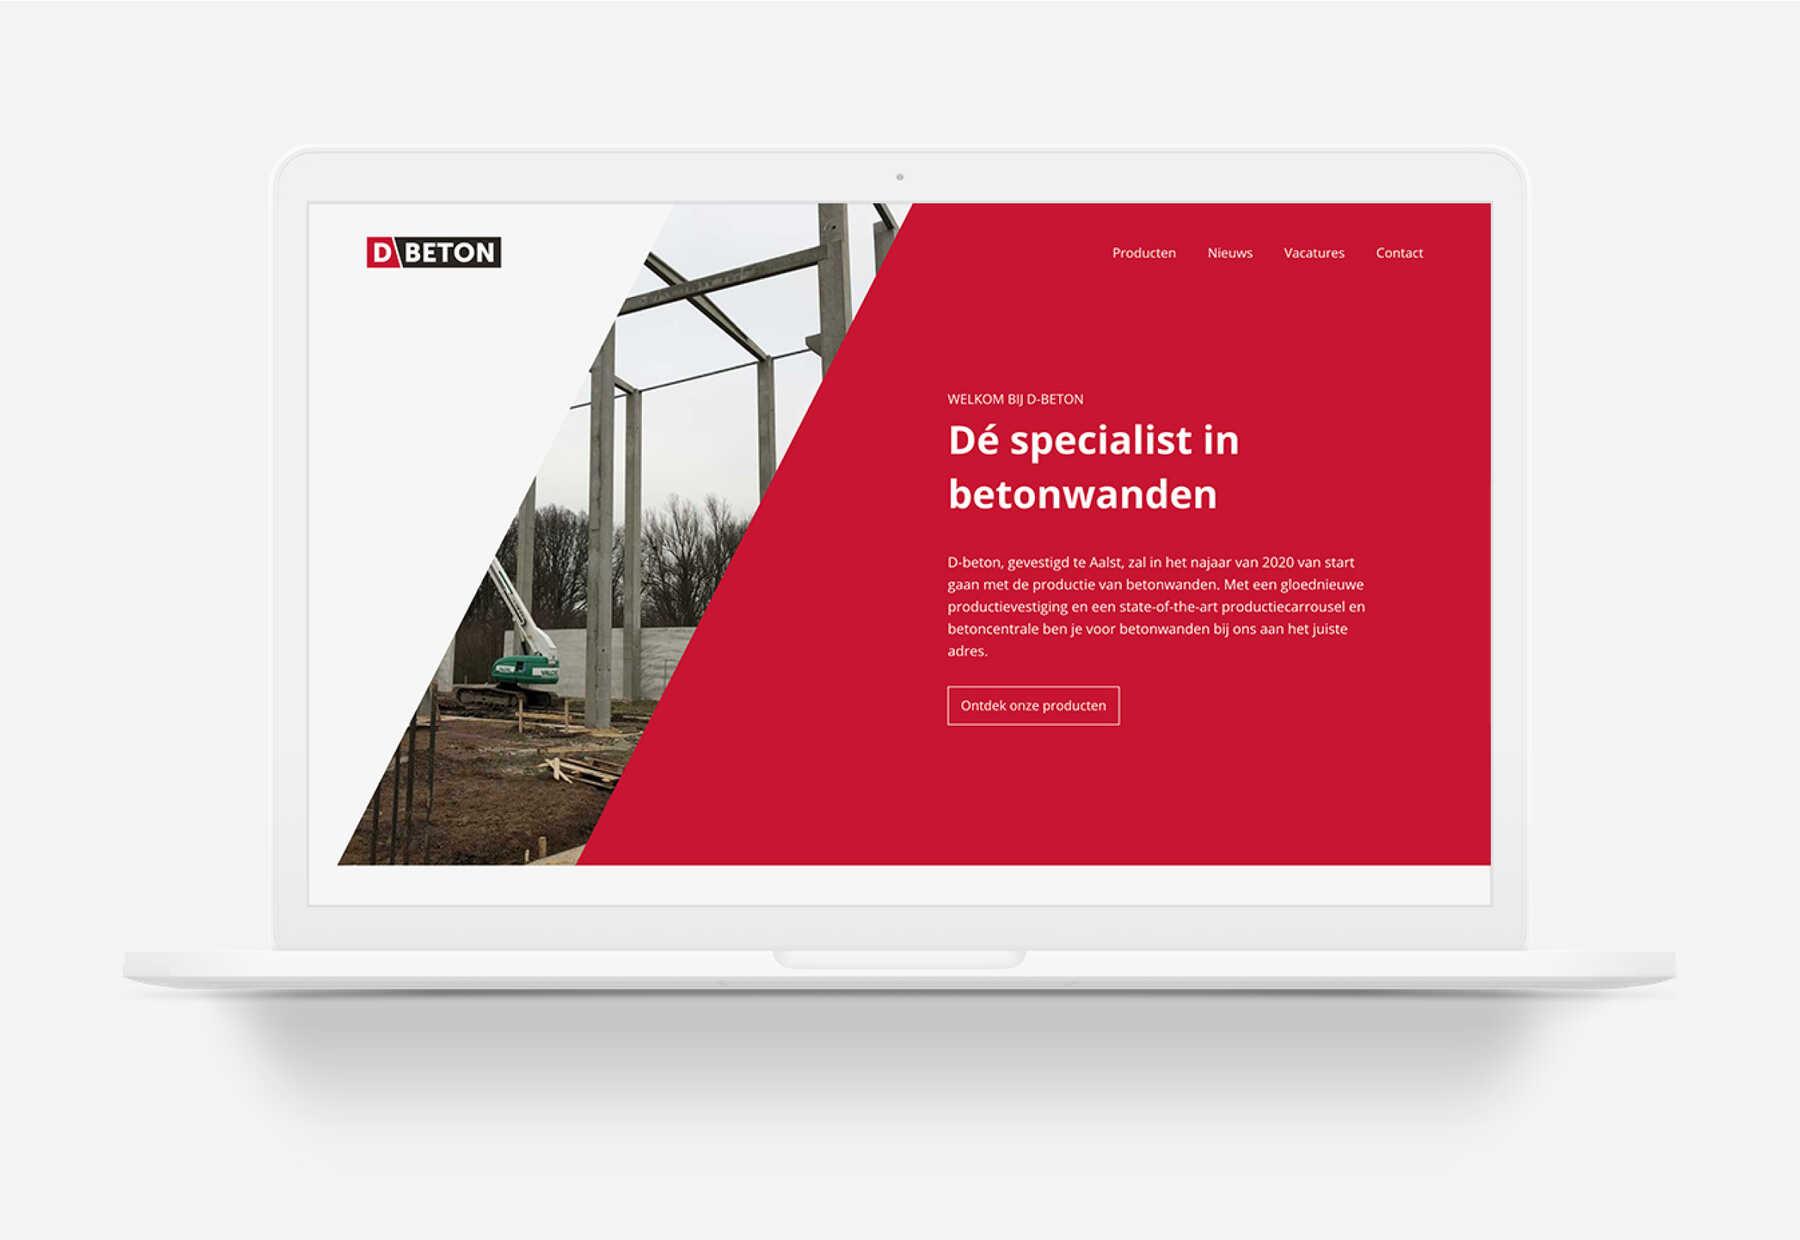 D-beton webdesign